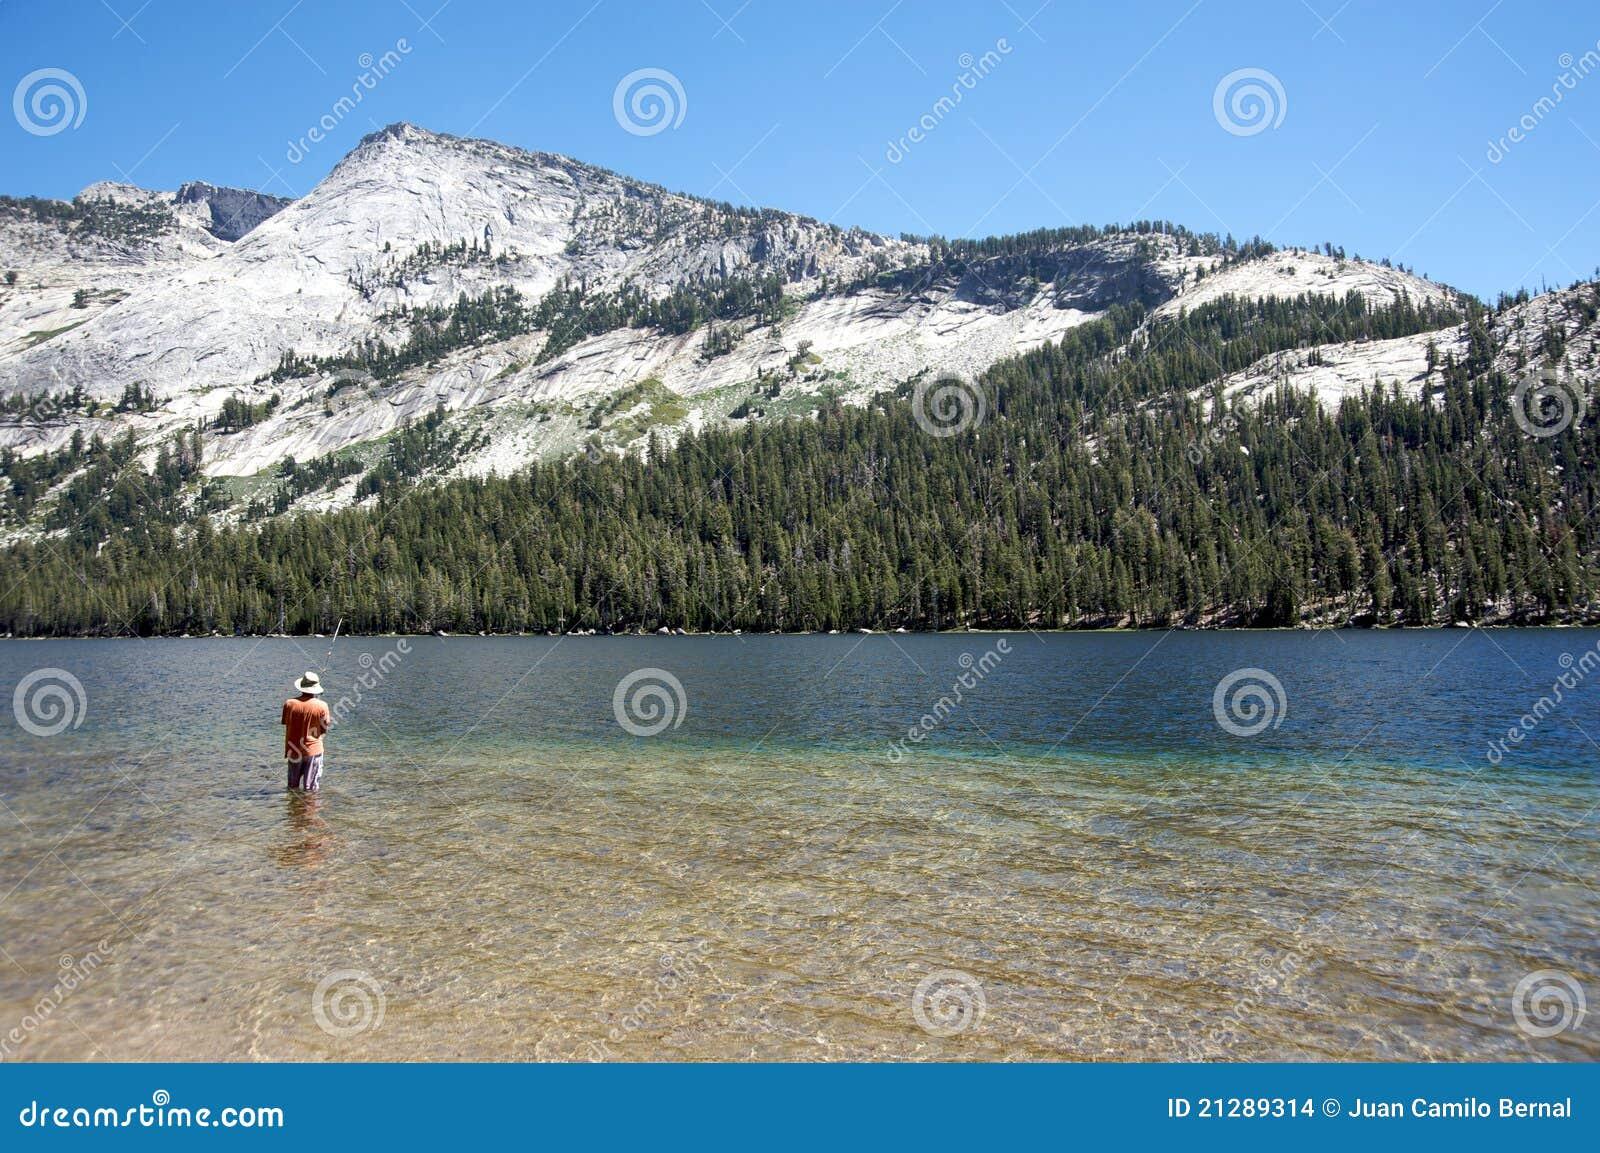 Man fishing in a lake in yosemite stock images image for Fishing in yosemite